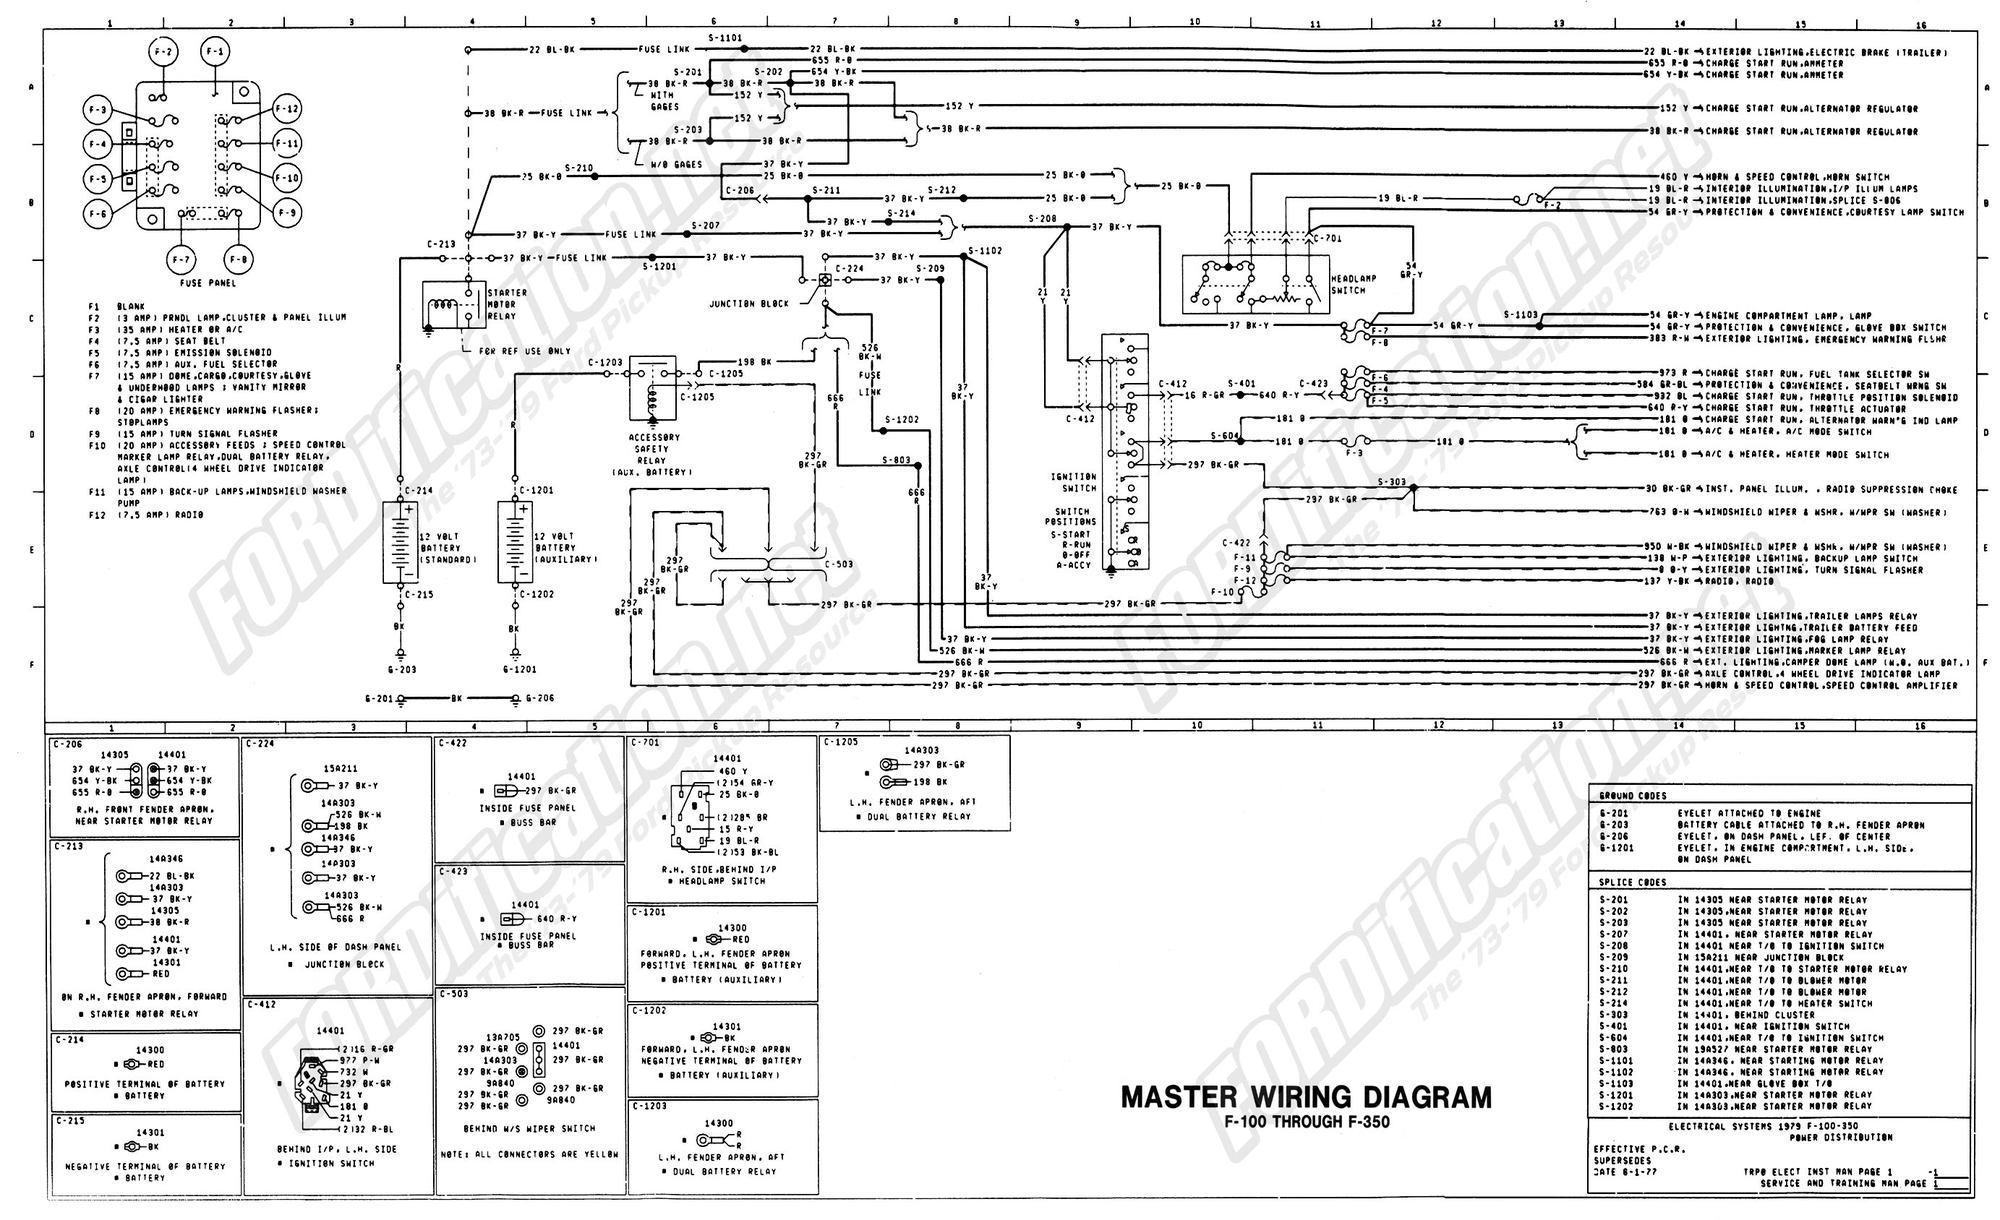 Diagrams#34002200: International Dt466 Engine Electrical Diagram ...